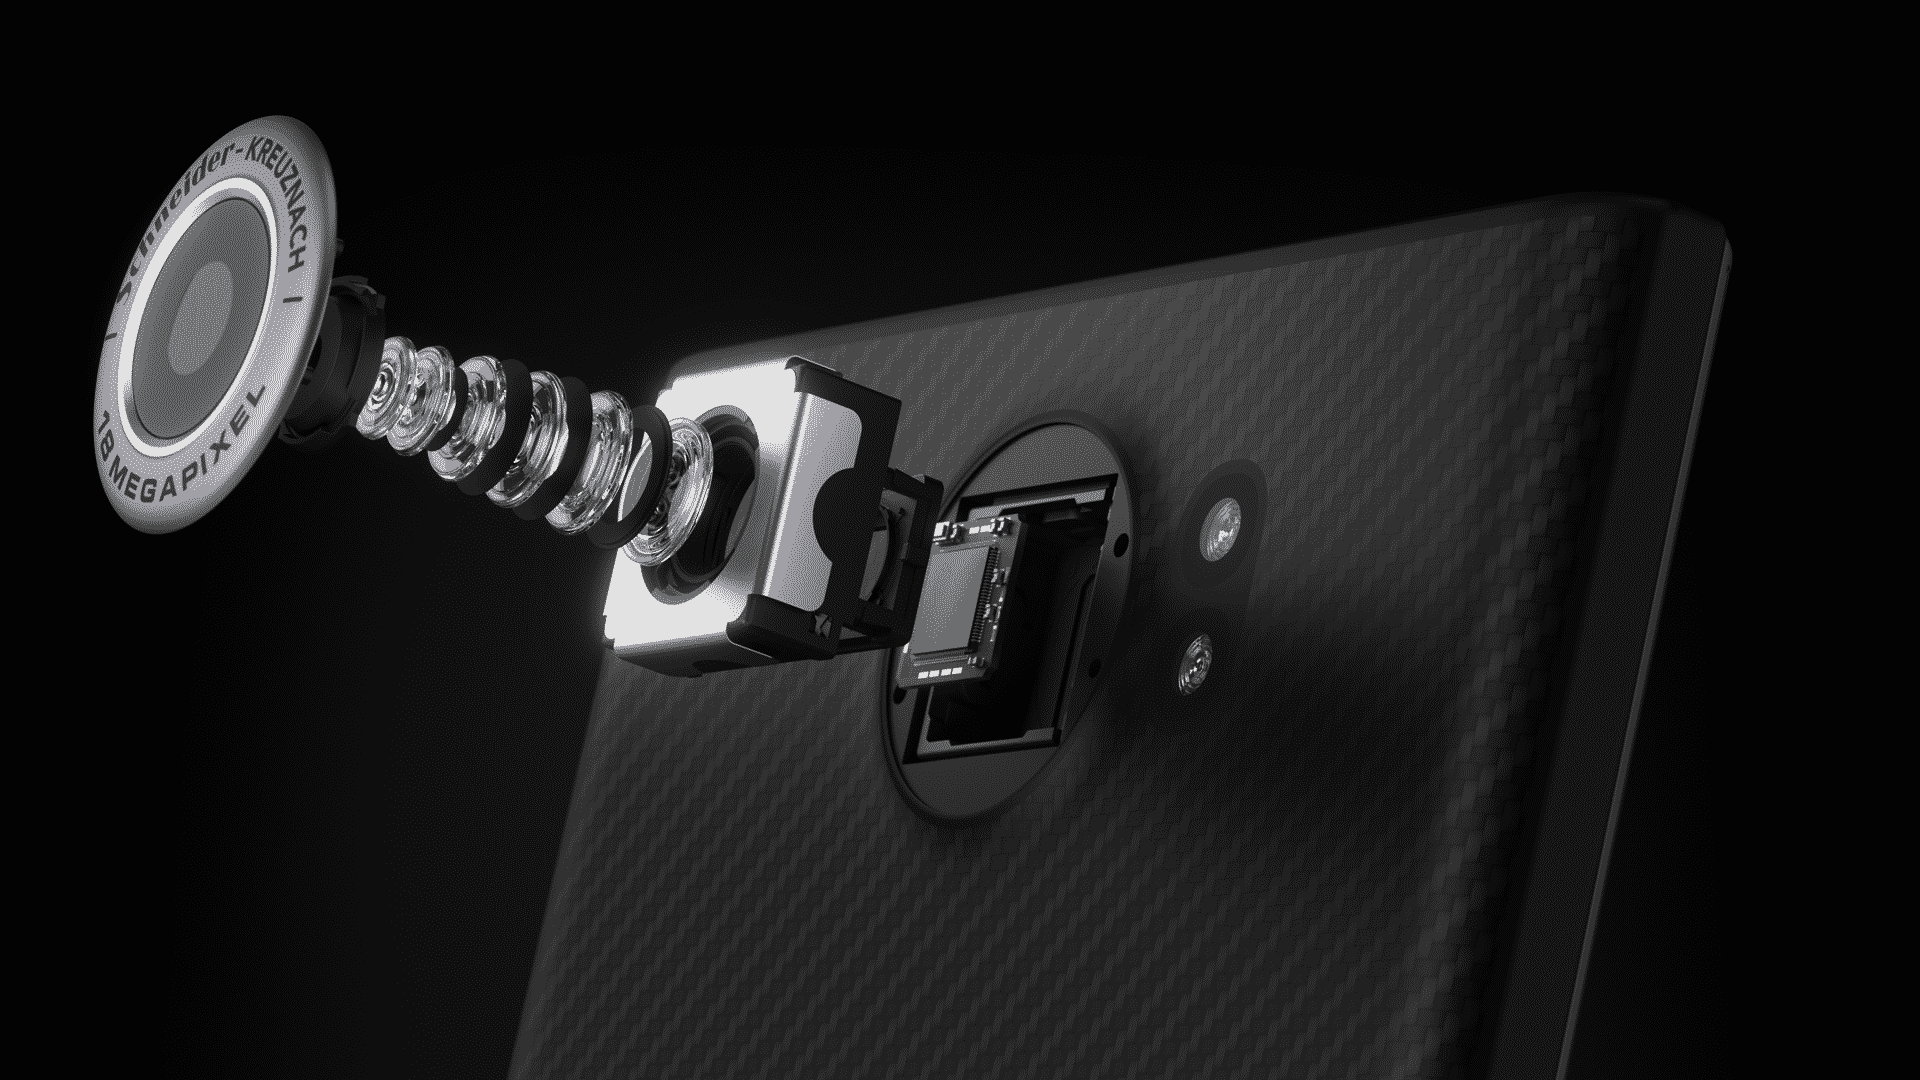 BlackBerry-Priv1 مراجعة BlackBerry Priv: أفضل هاتف أندرويد أمن